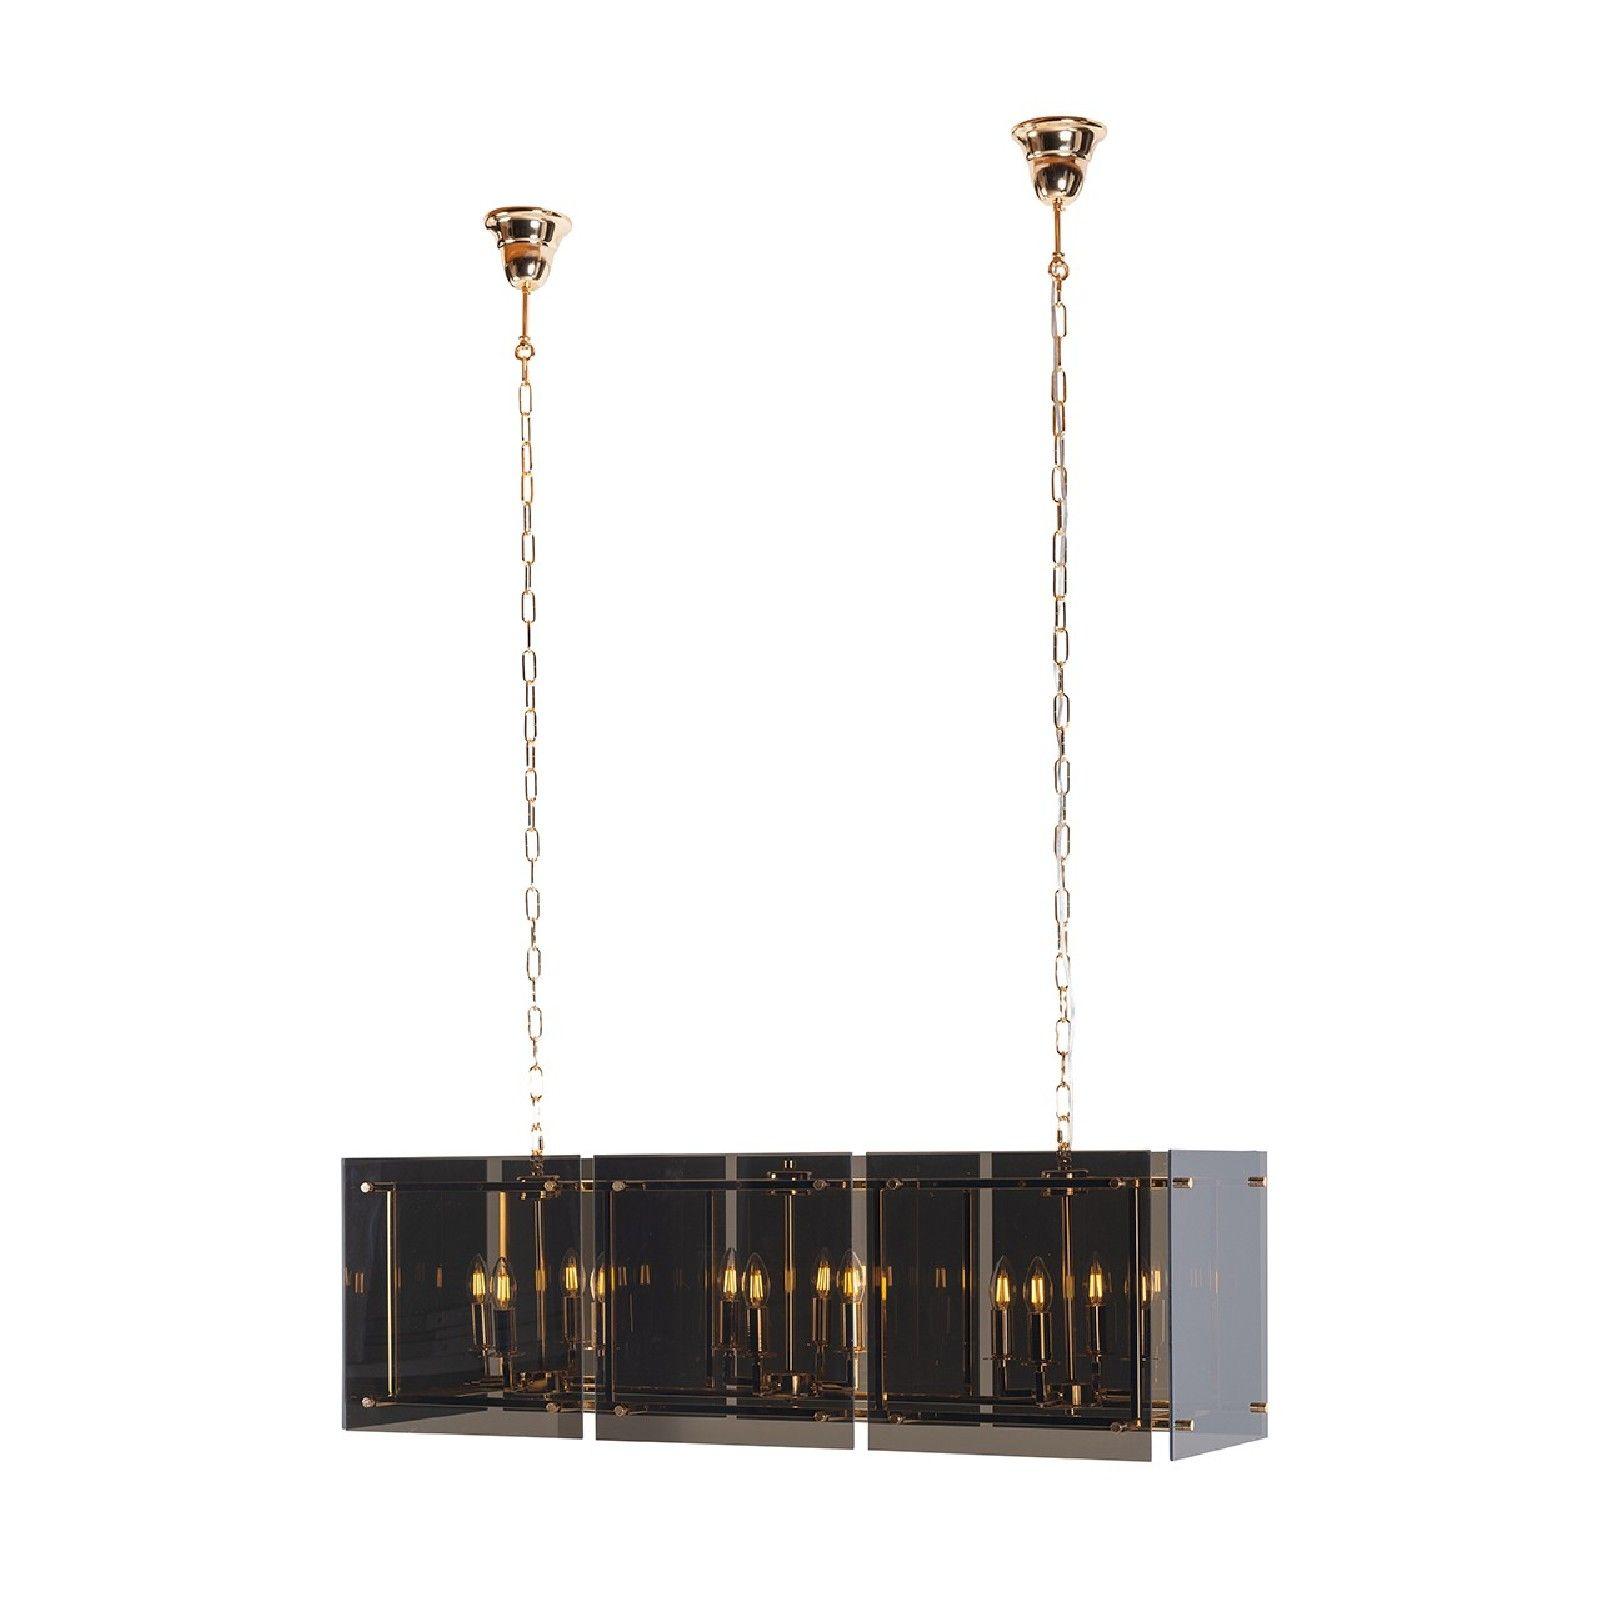 Lampe suspendue Cyrah Suspensions et plafonniers - 10